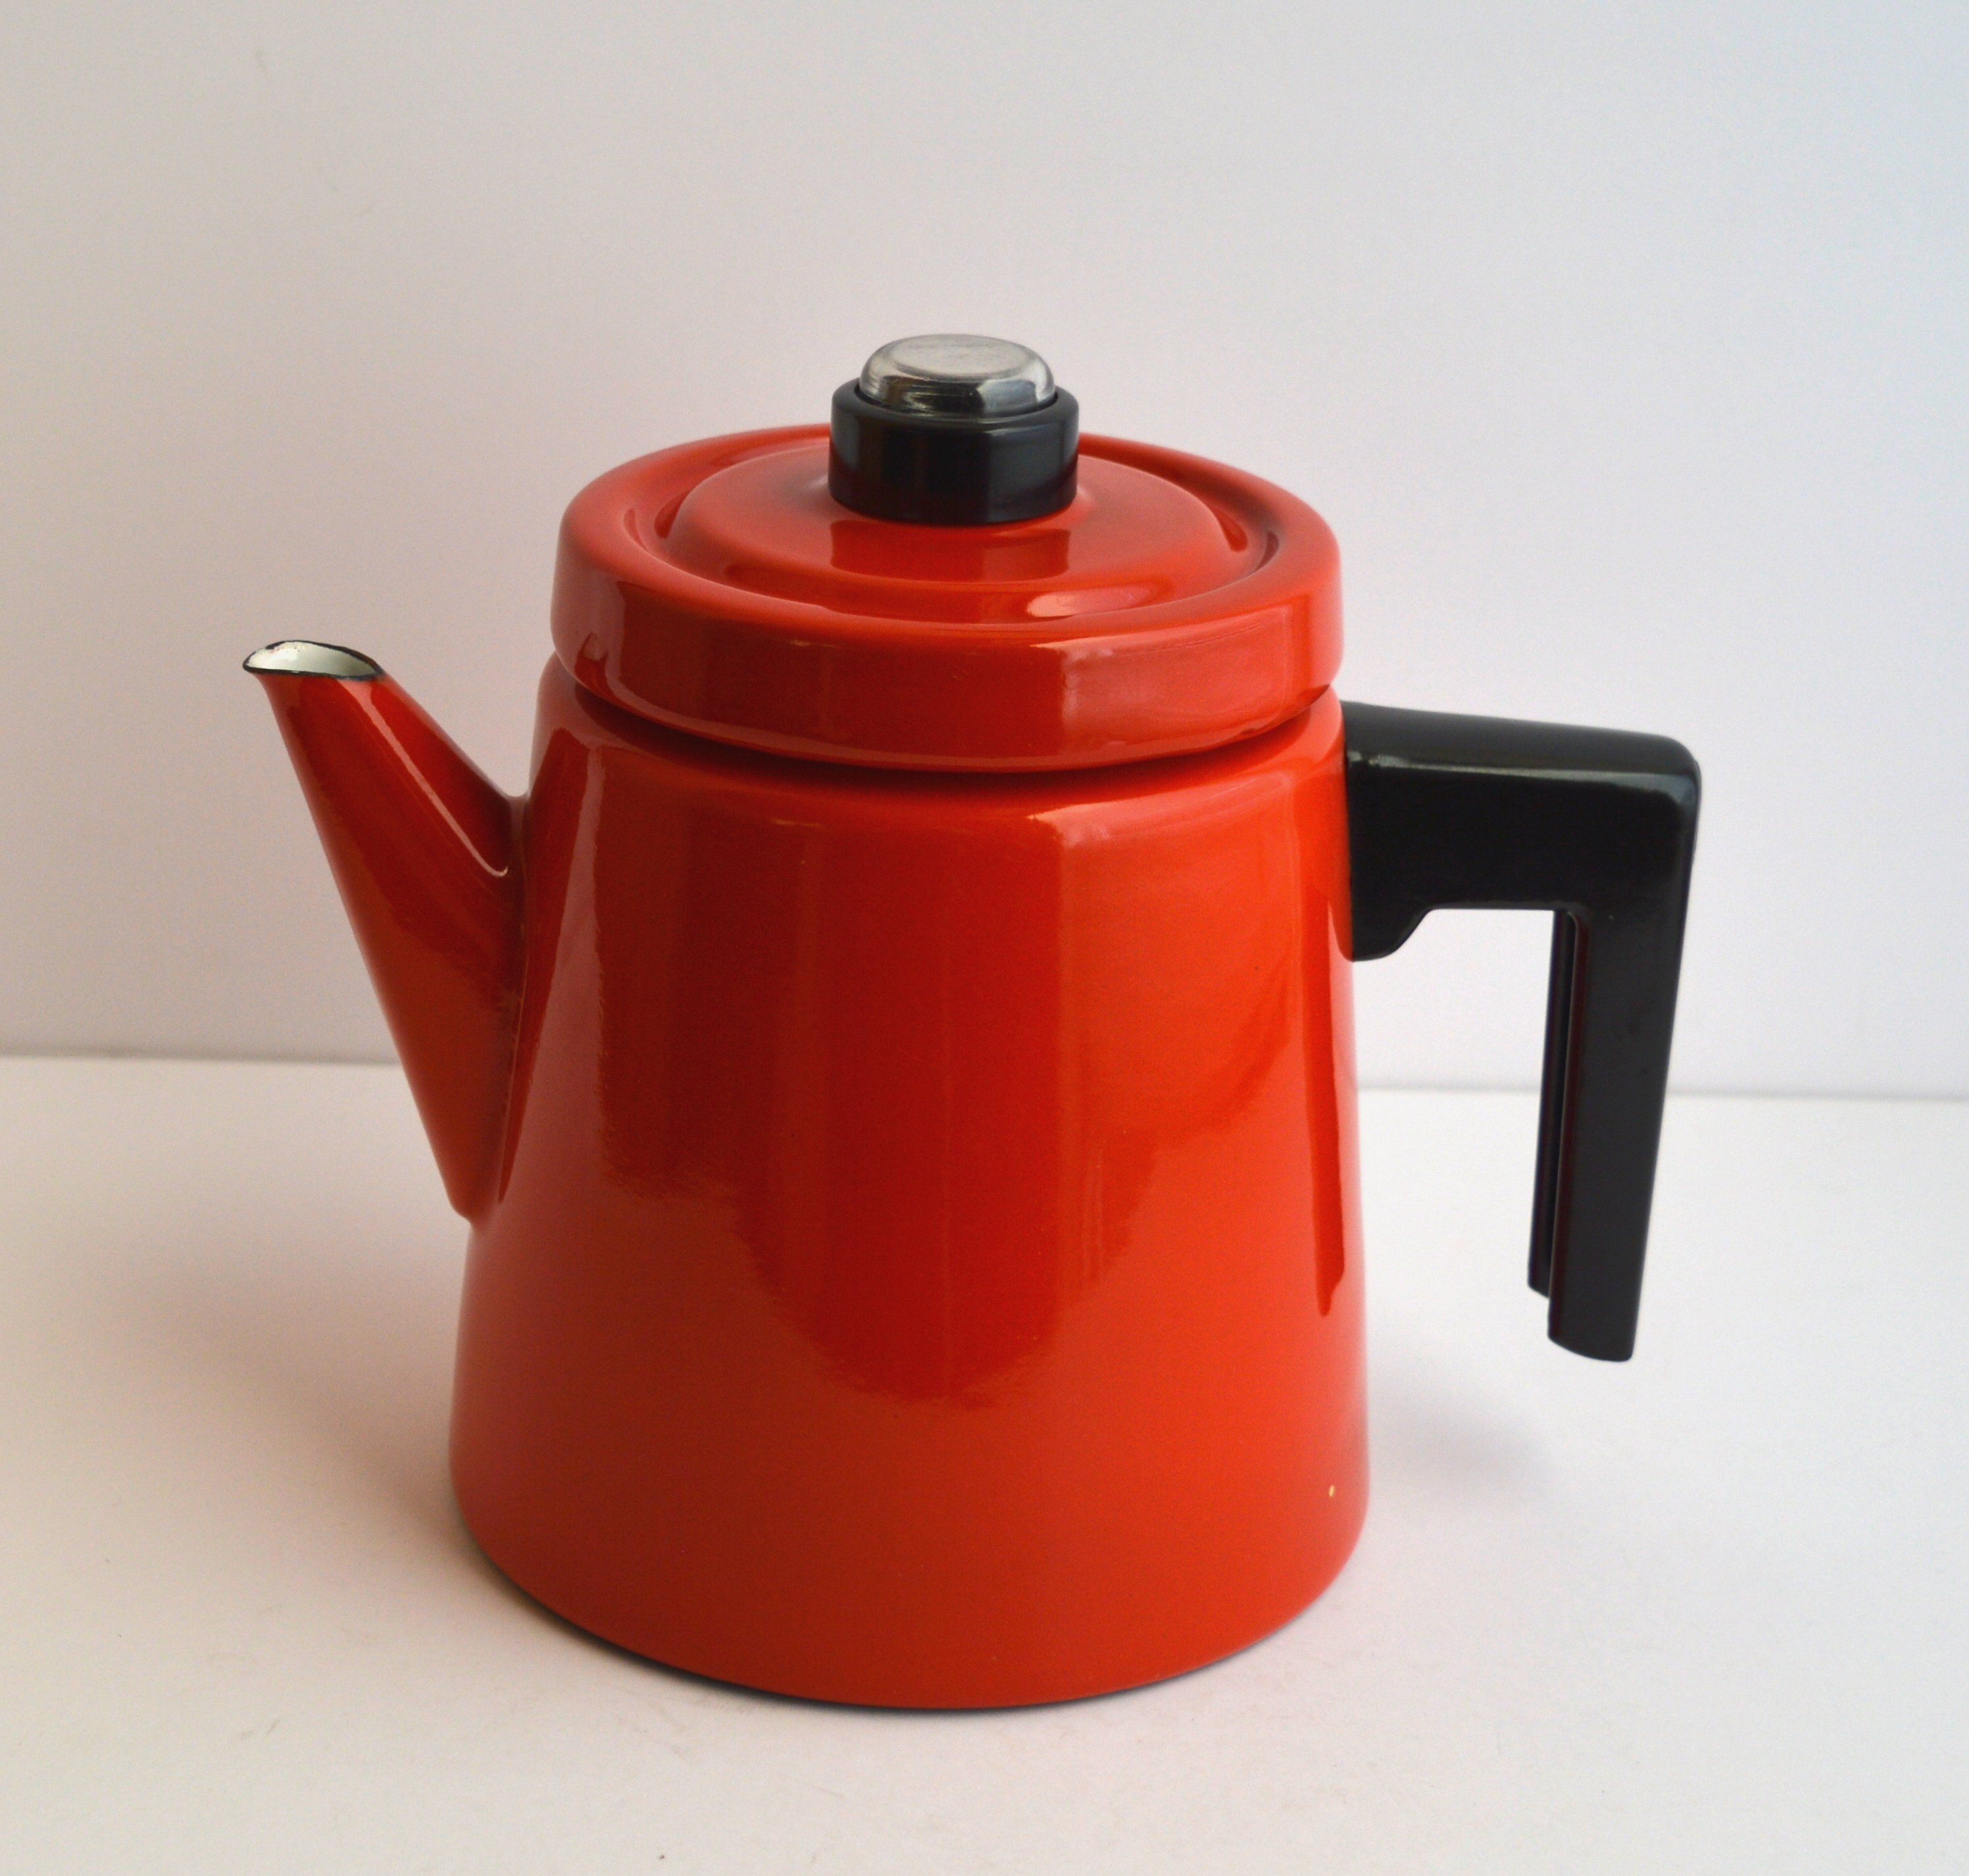 Red Enamel Coffee Pot Percolator Pehtoori Antti In 2020 Coffee Pot Percolator Percolator Coffee